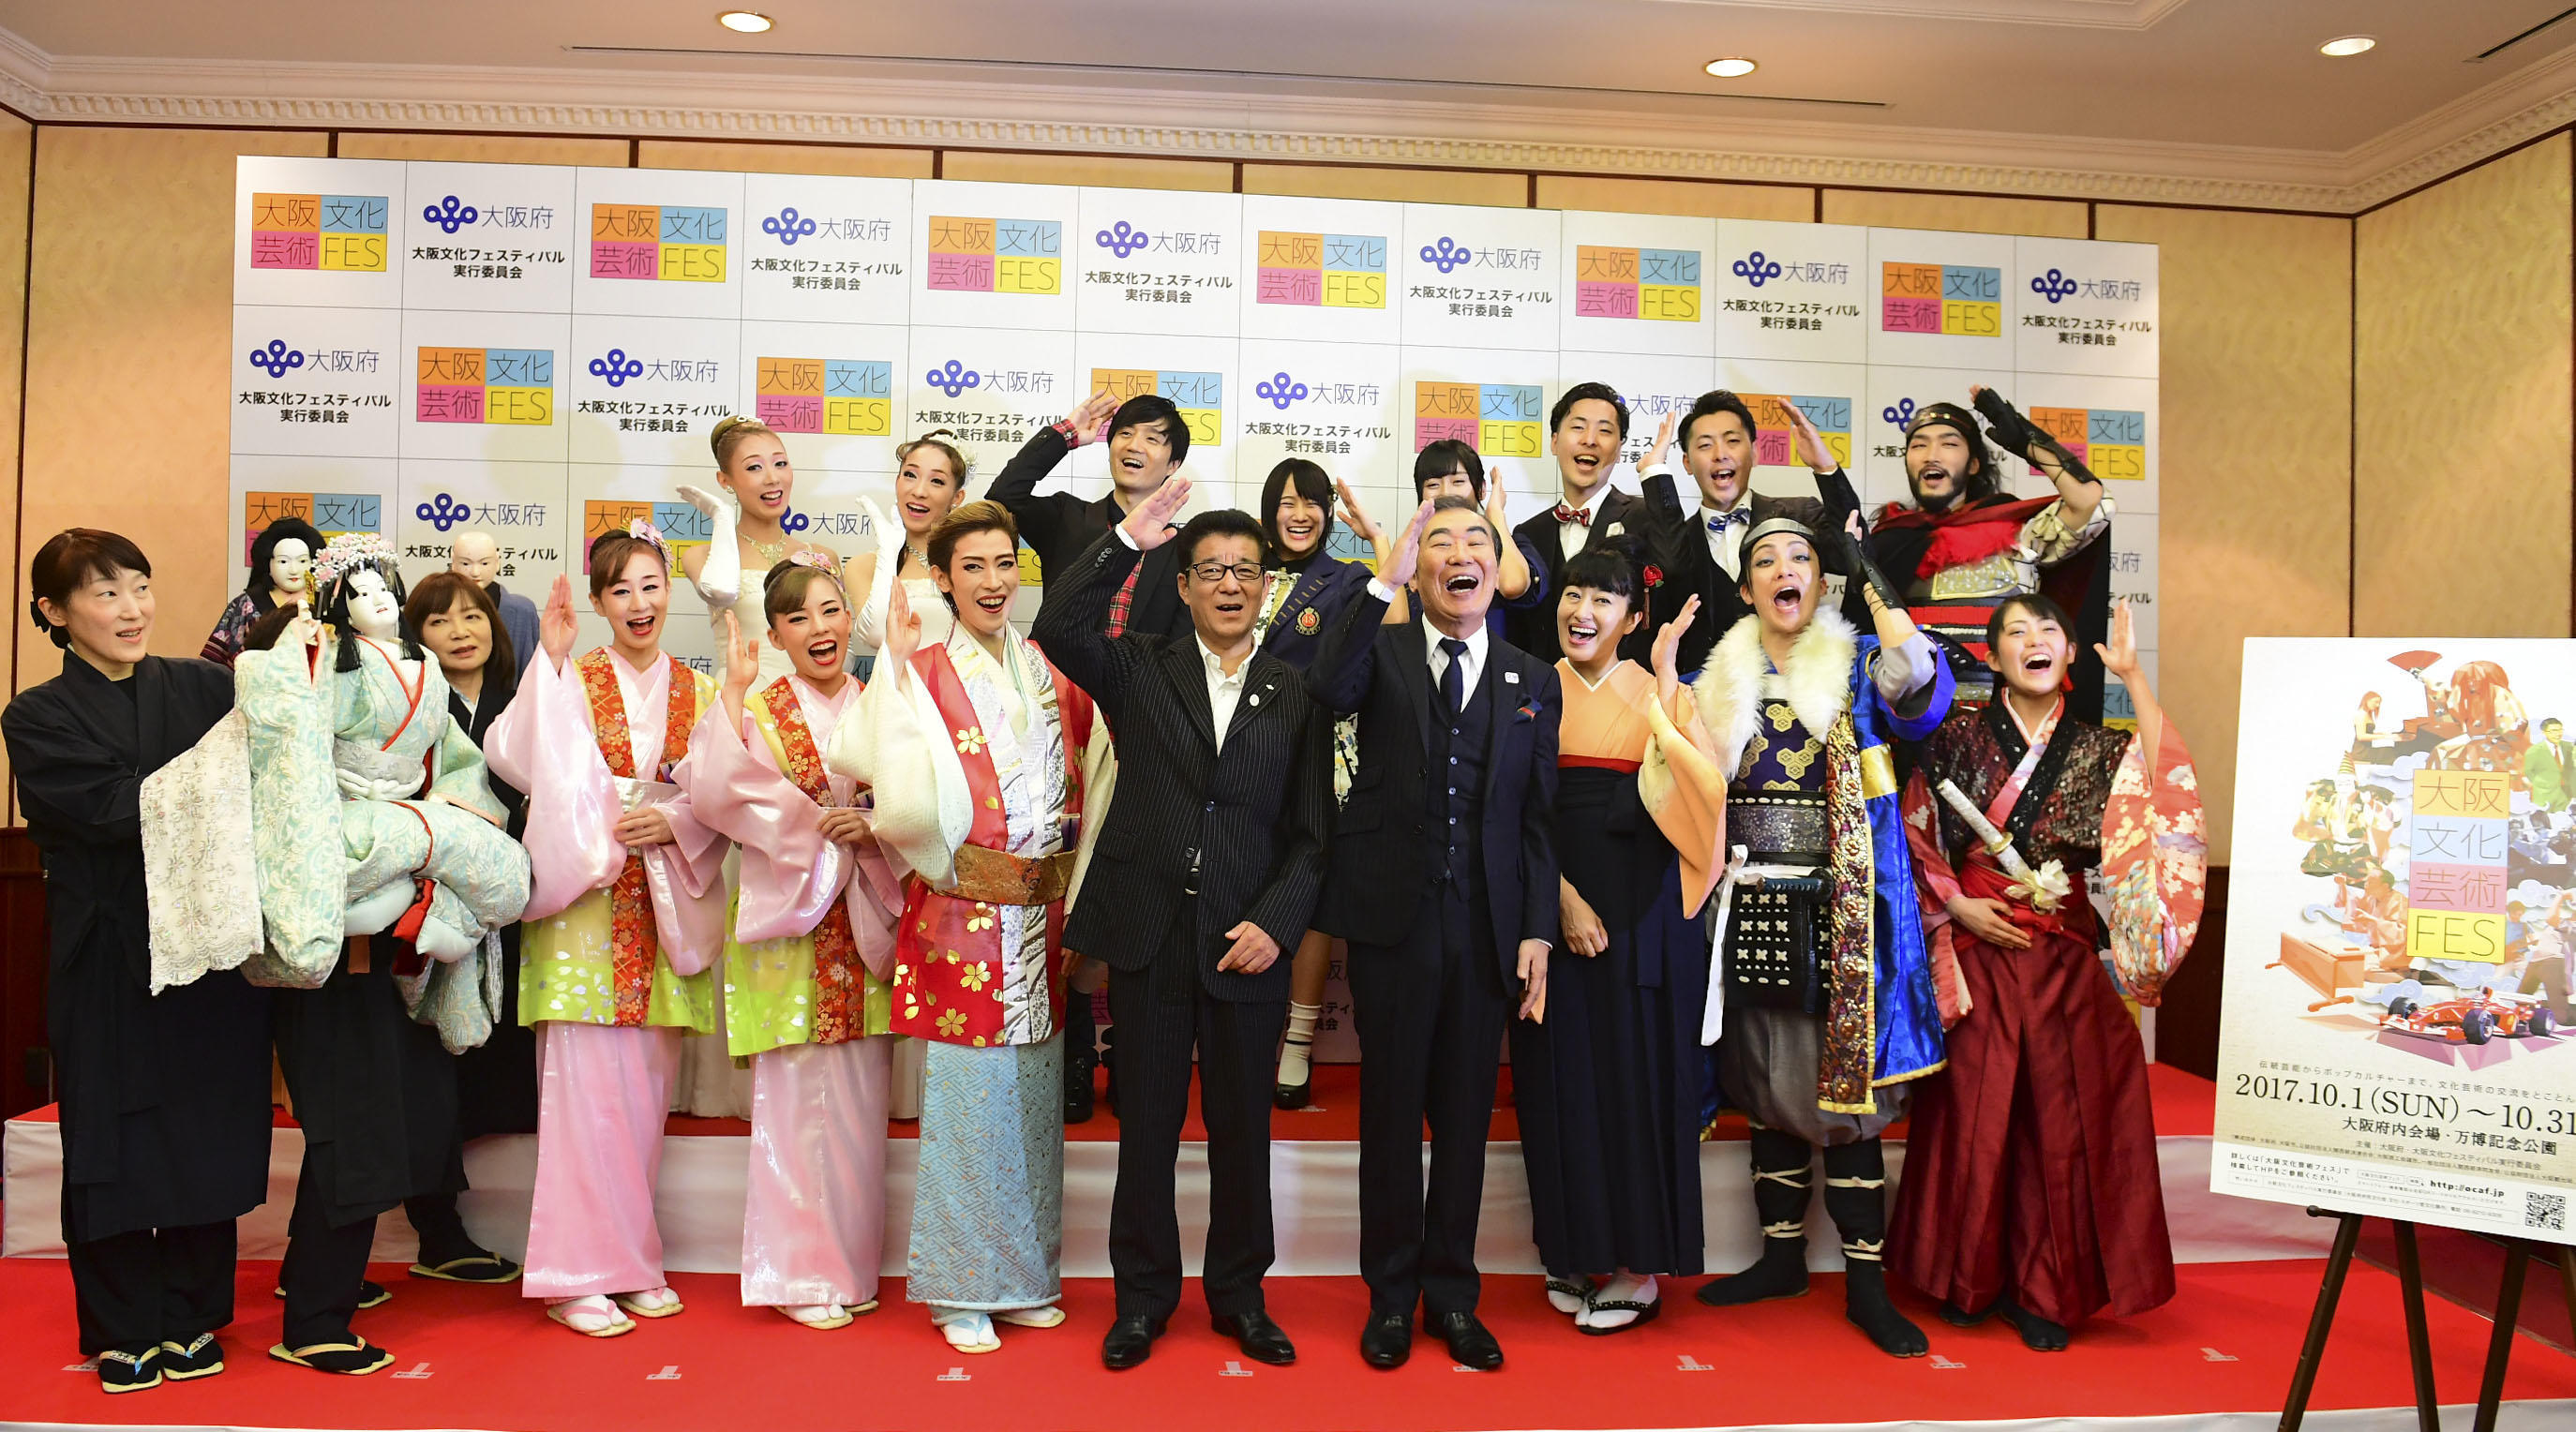 http://news.yoshimoto.co.jp/20170927101812-ad60234aafdc974540d2d4e02b942436a476b650.jpg